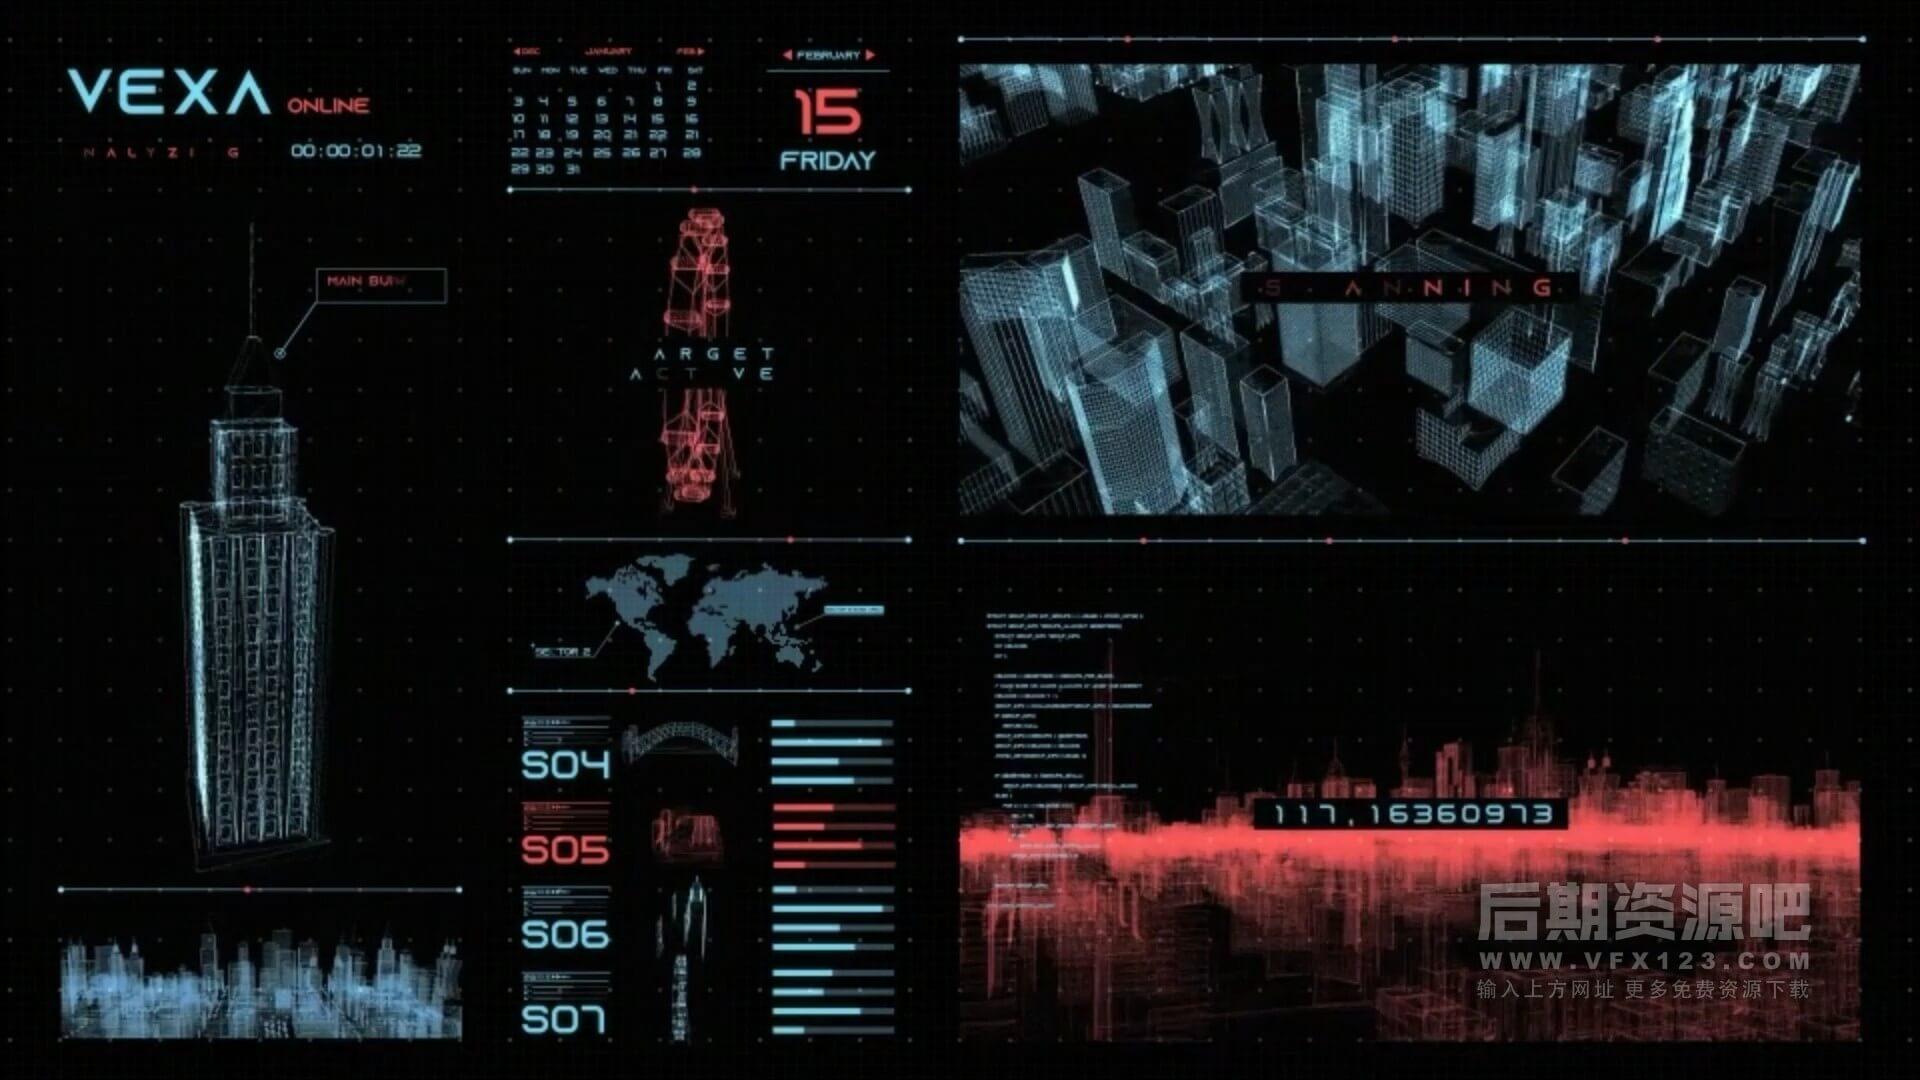 AE模板 430+HUD界面元素16分类含色彩控制 Vexa HUD Infographics V2